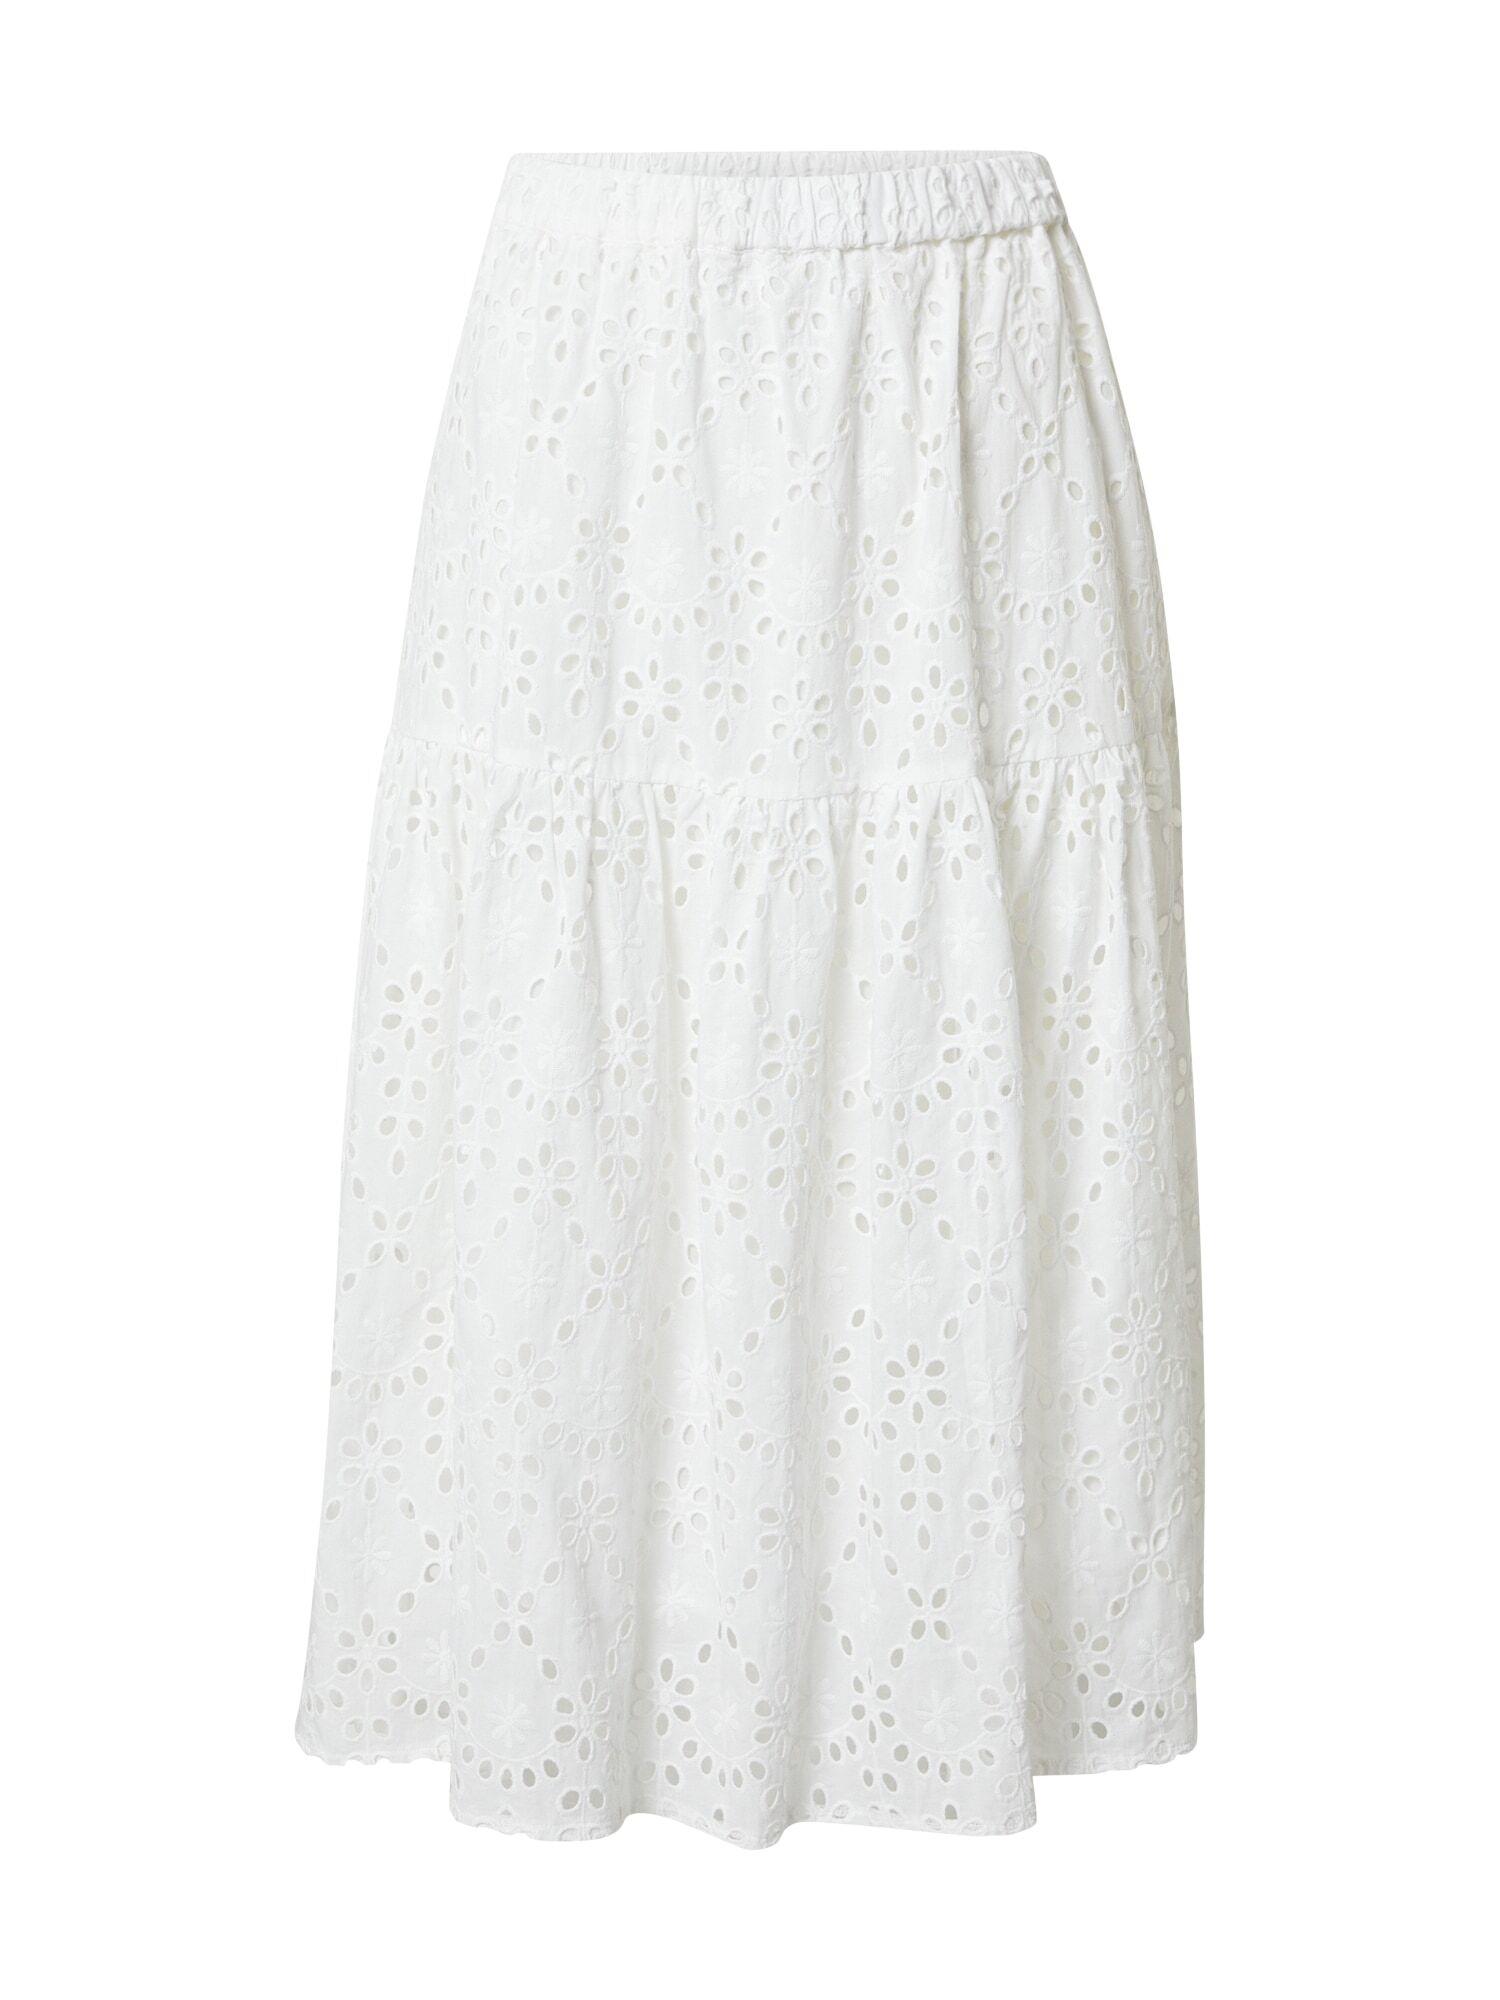 Princess Jupe 'Hole'  - Blanc - Taille: 40 - female